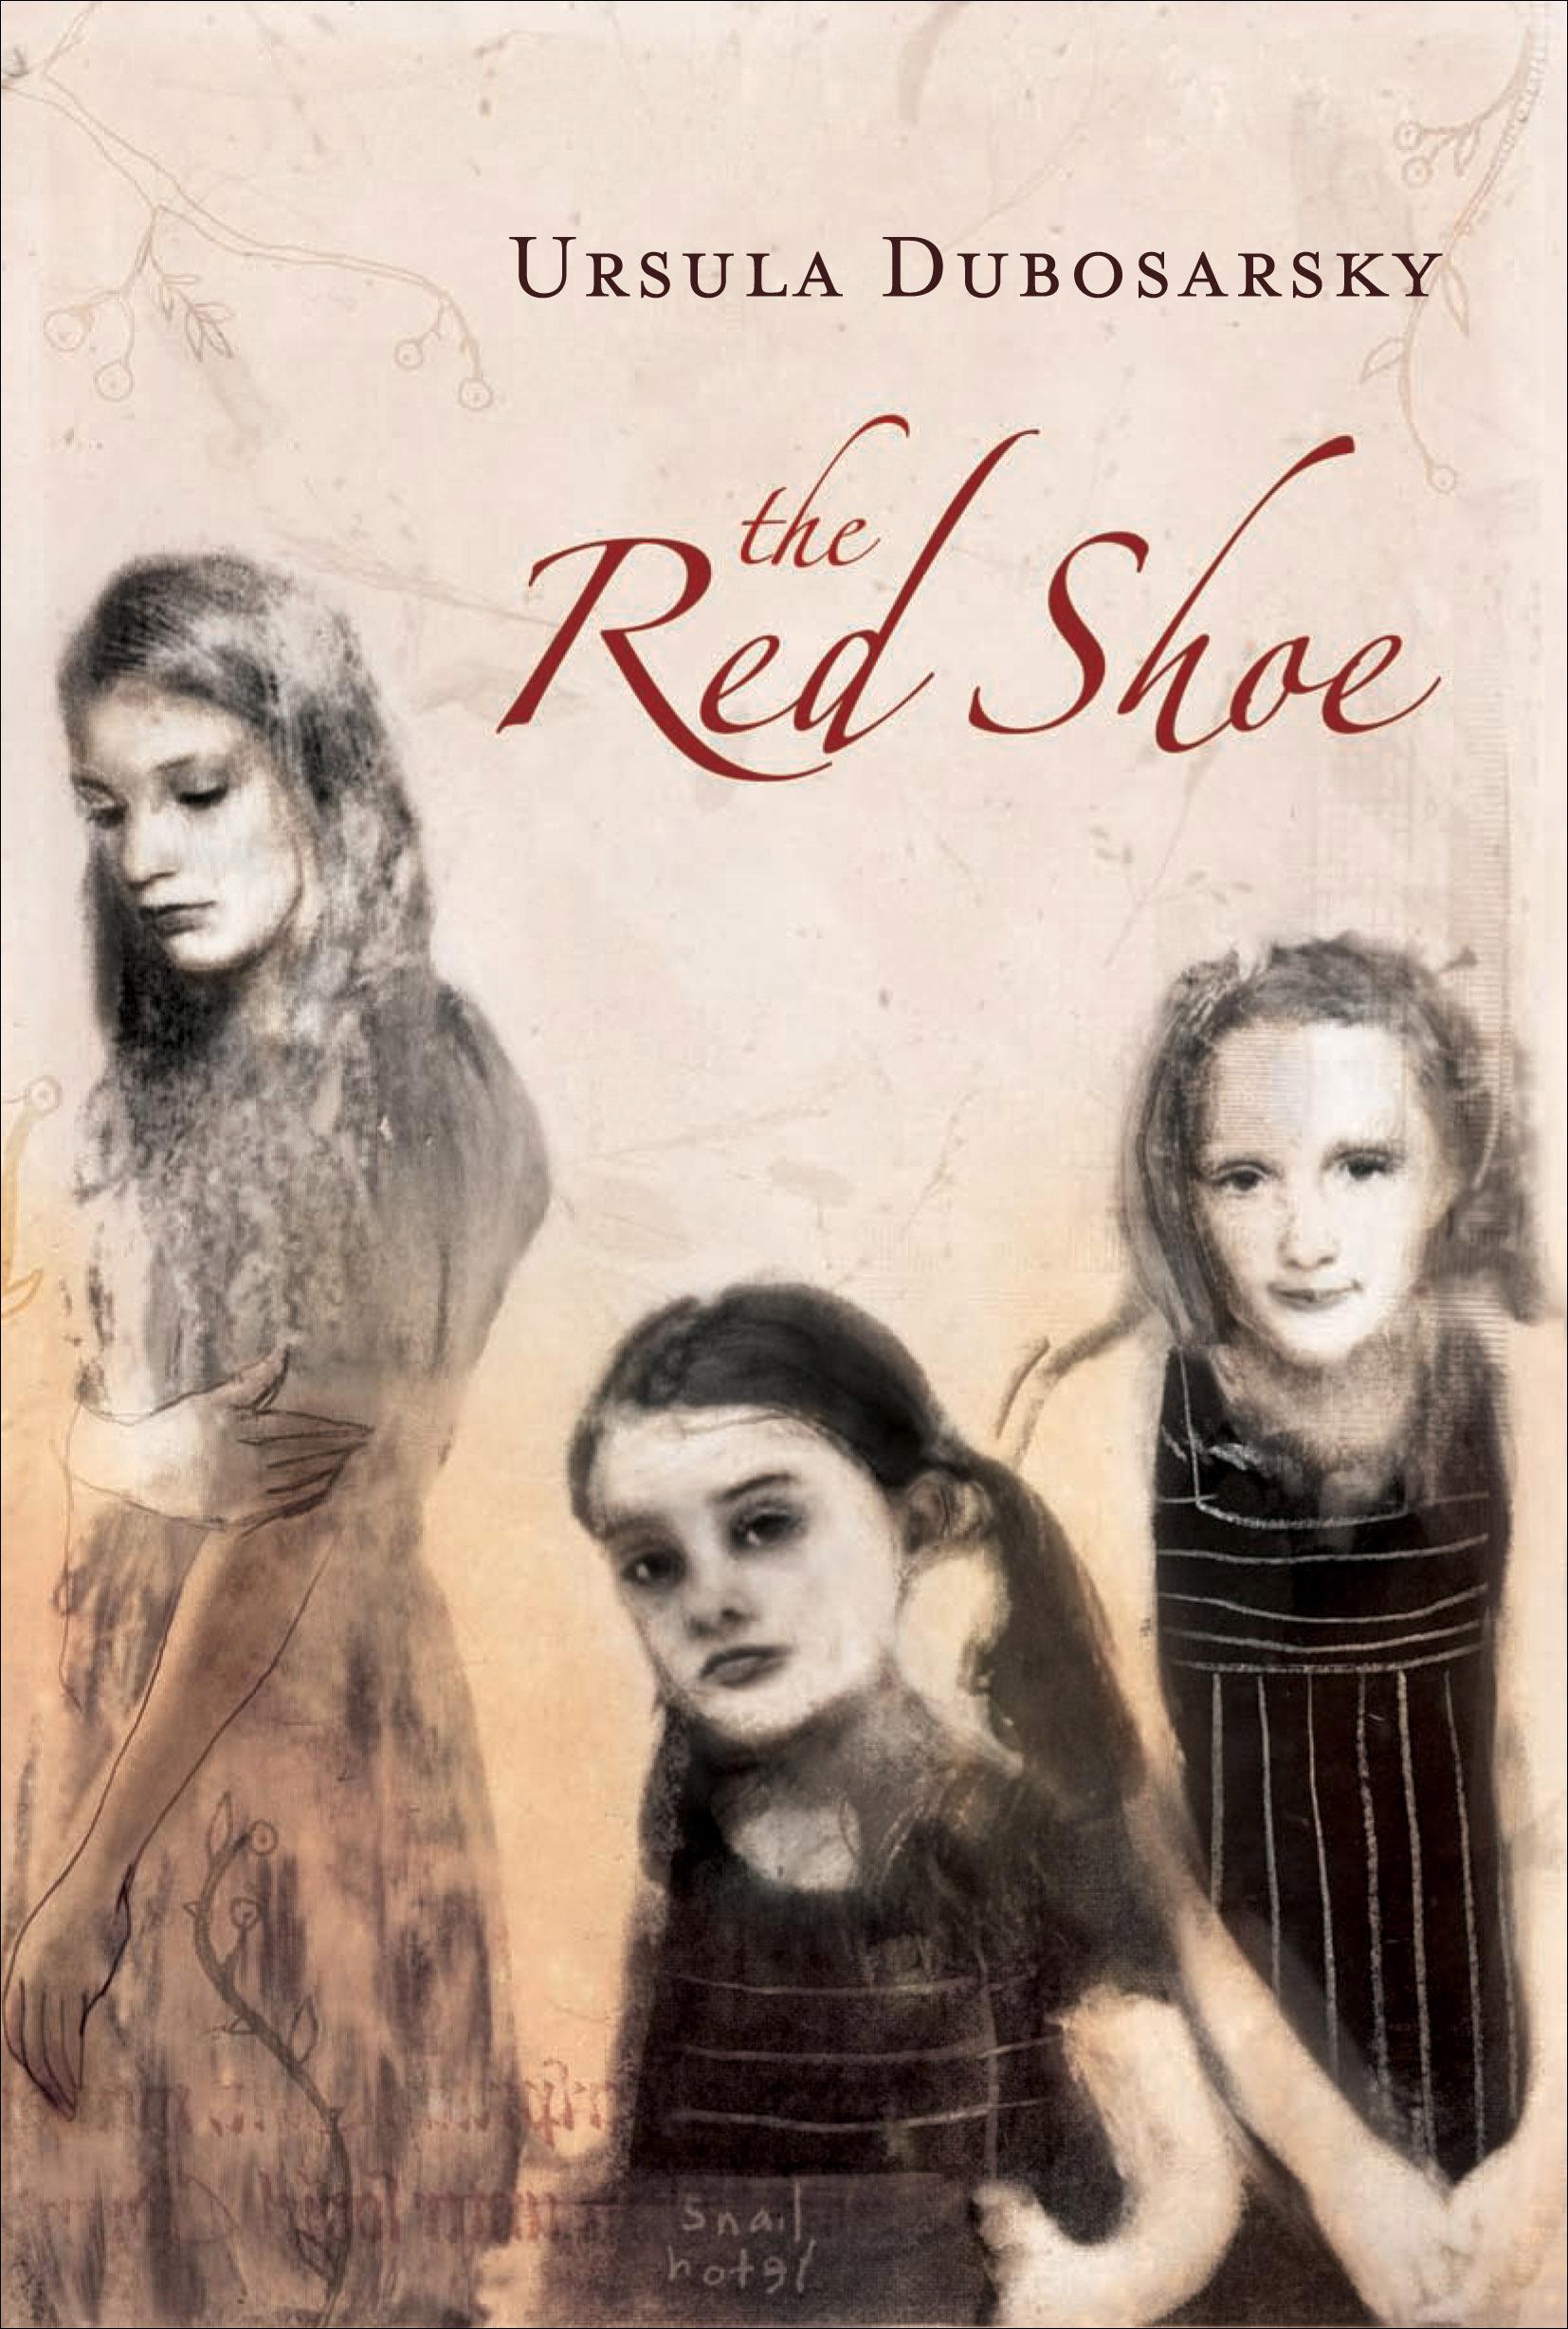 The Red Shoe - Ursula Dubosarsky - 9781741142853 - Allen & Unwin ...